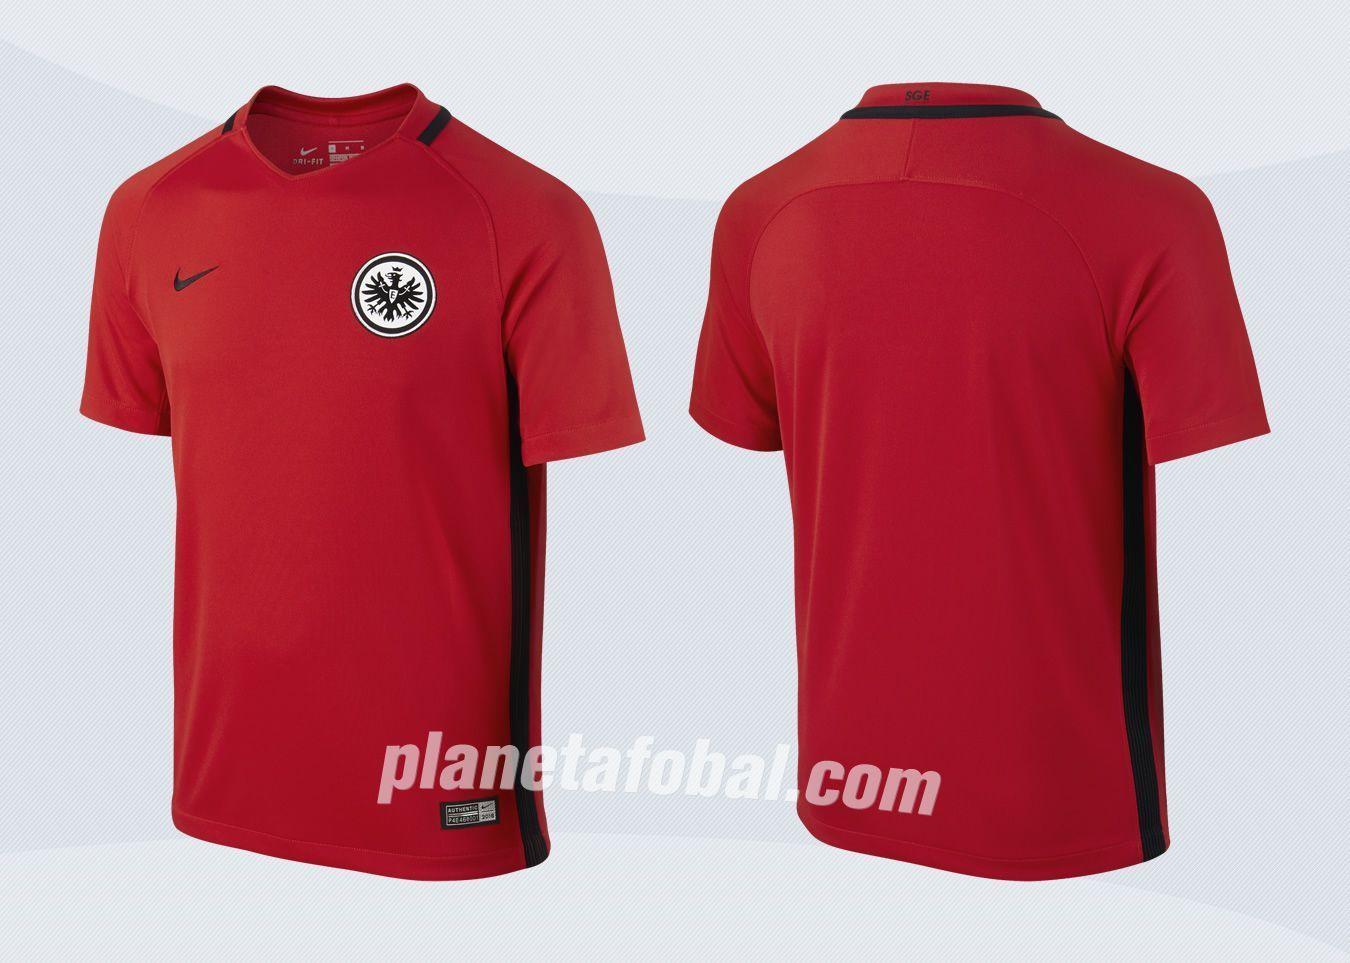 Camiseta suplente | Imágenes Nike